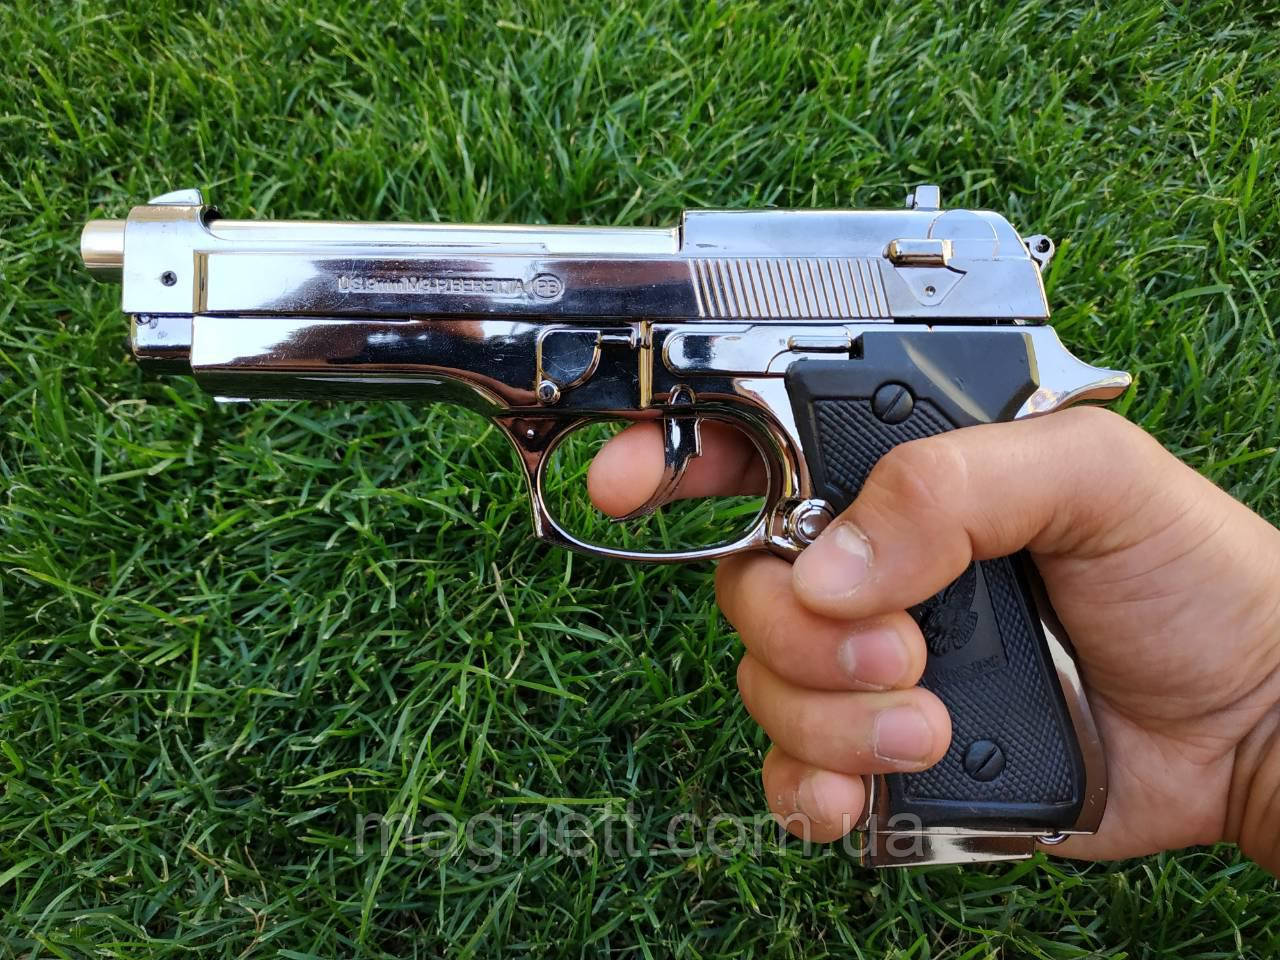 Пистолет зажигалка Беретта на подставке